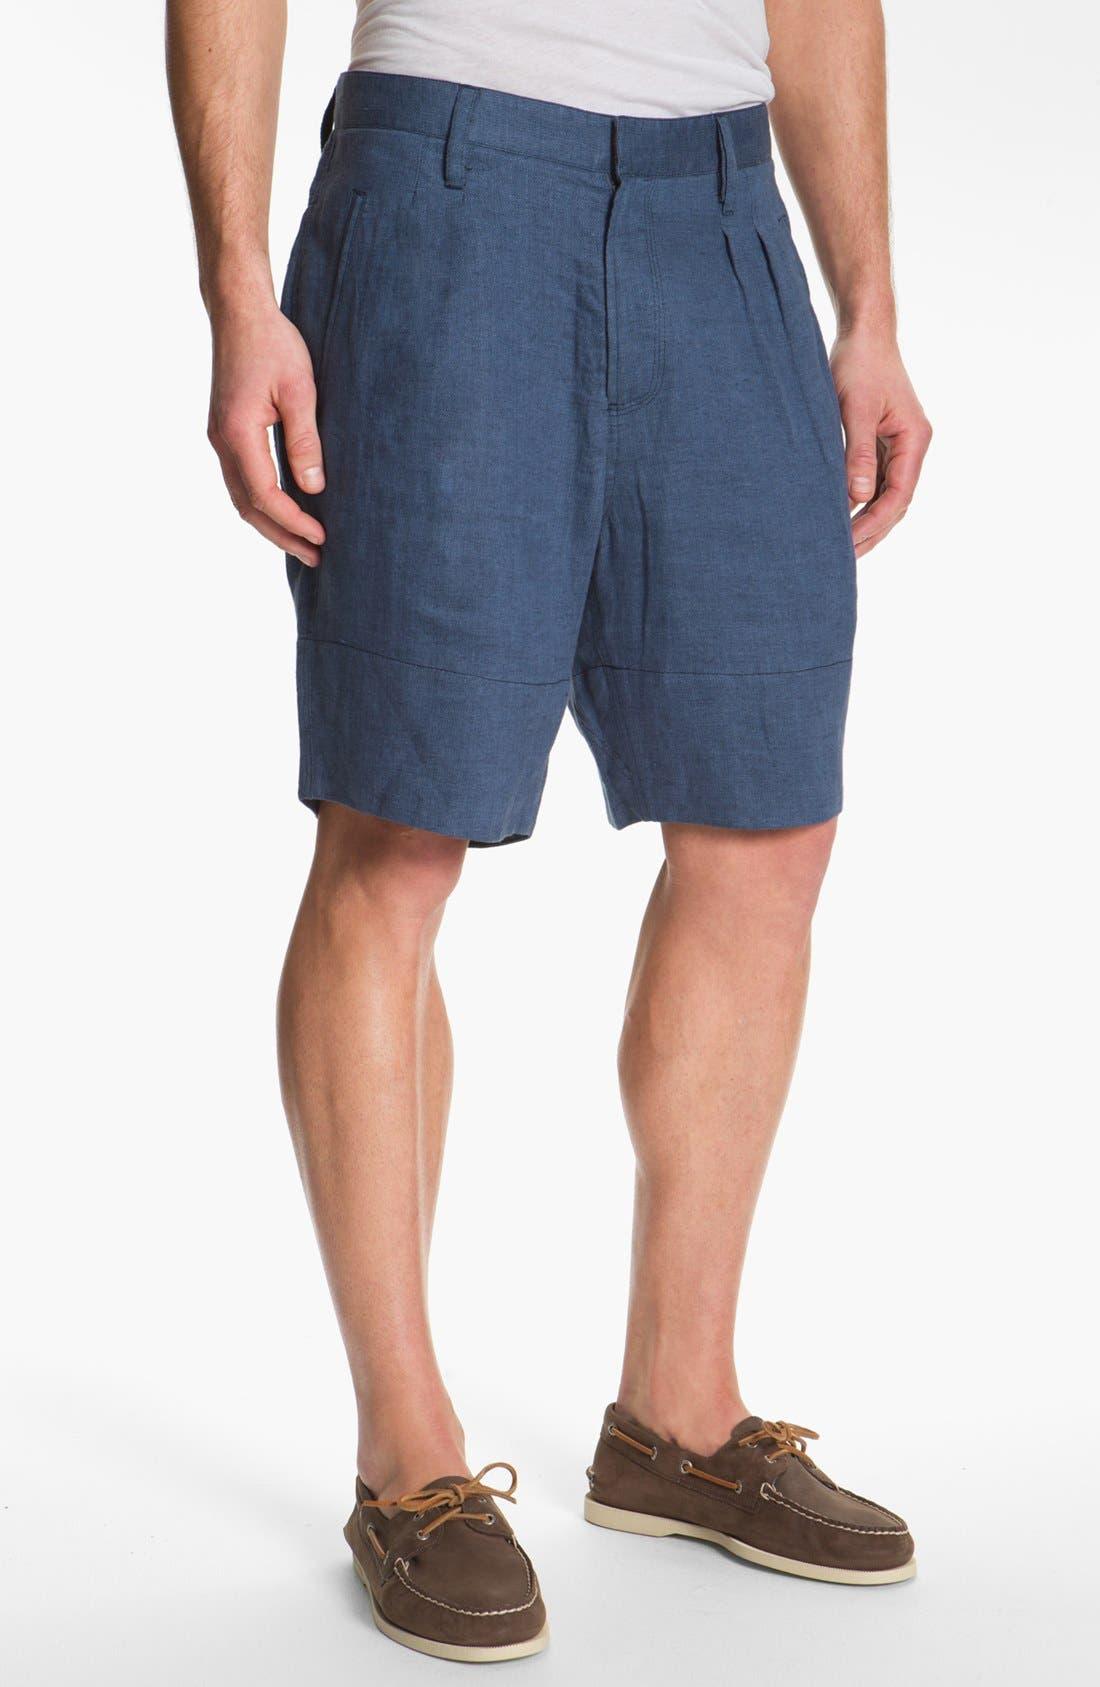 Alternate Image 1 Selected - Hyden Yoo 'William' Linen Shorts